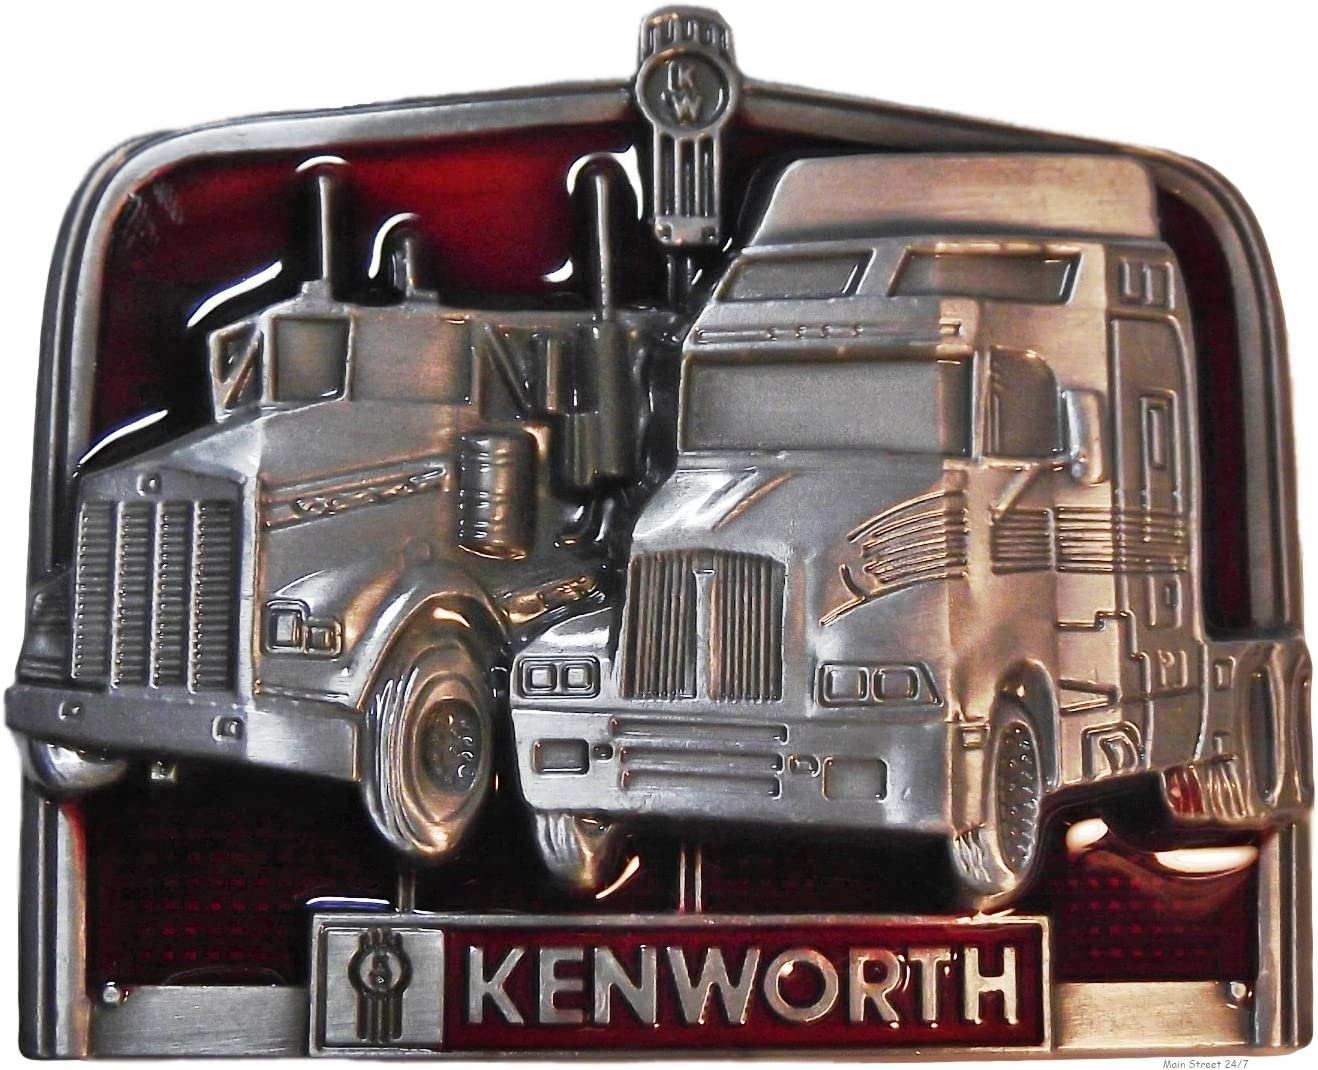 Main Street 24//7 Kenworth Trucks Pewter Finish Metal//Enamel Belt Buckle